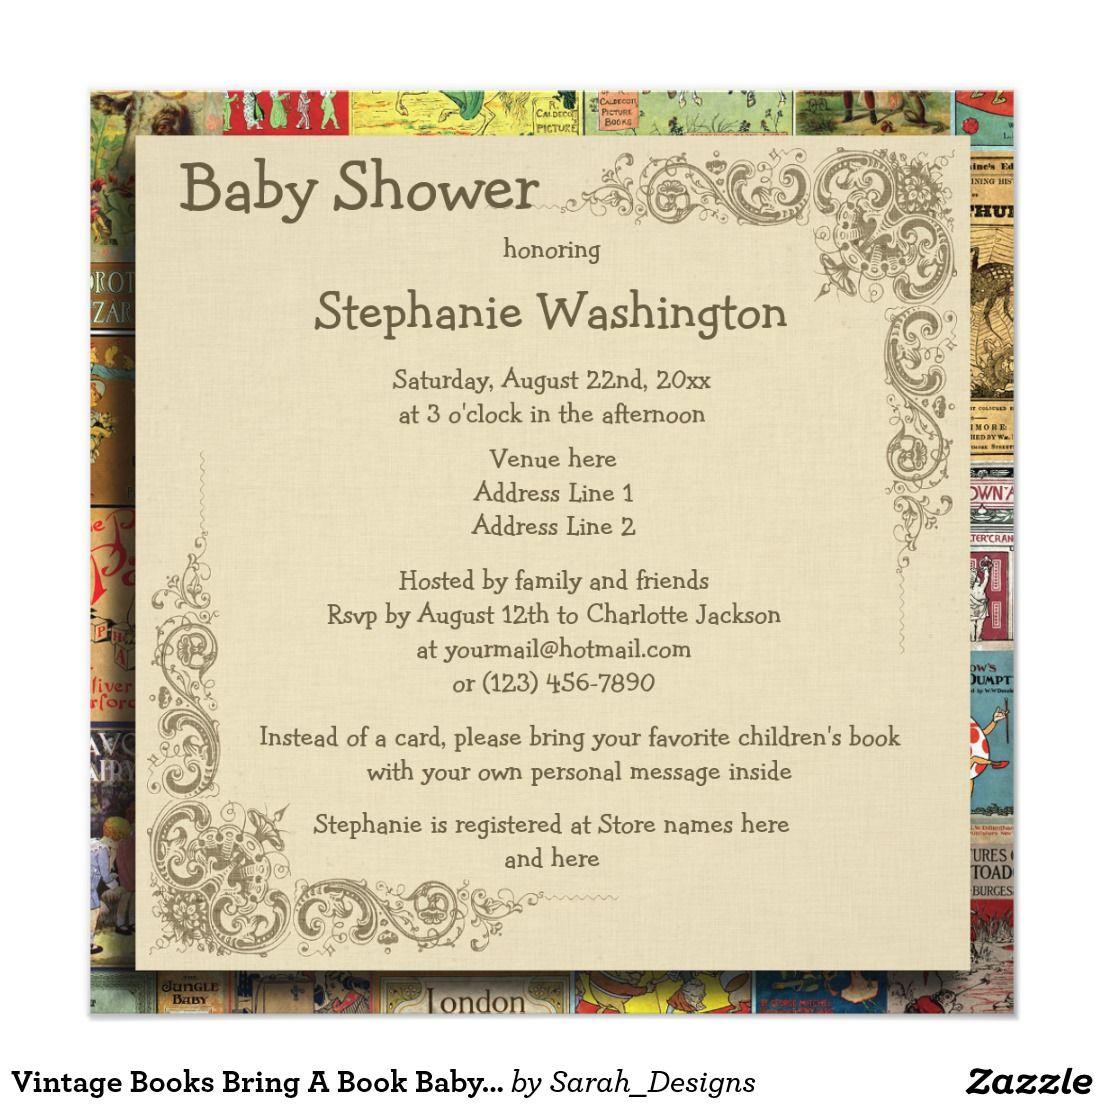 Vintage Books Bring A Book Baby Shower Invitation | Pinterest | Book ...